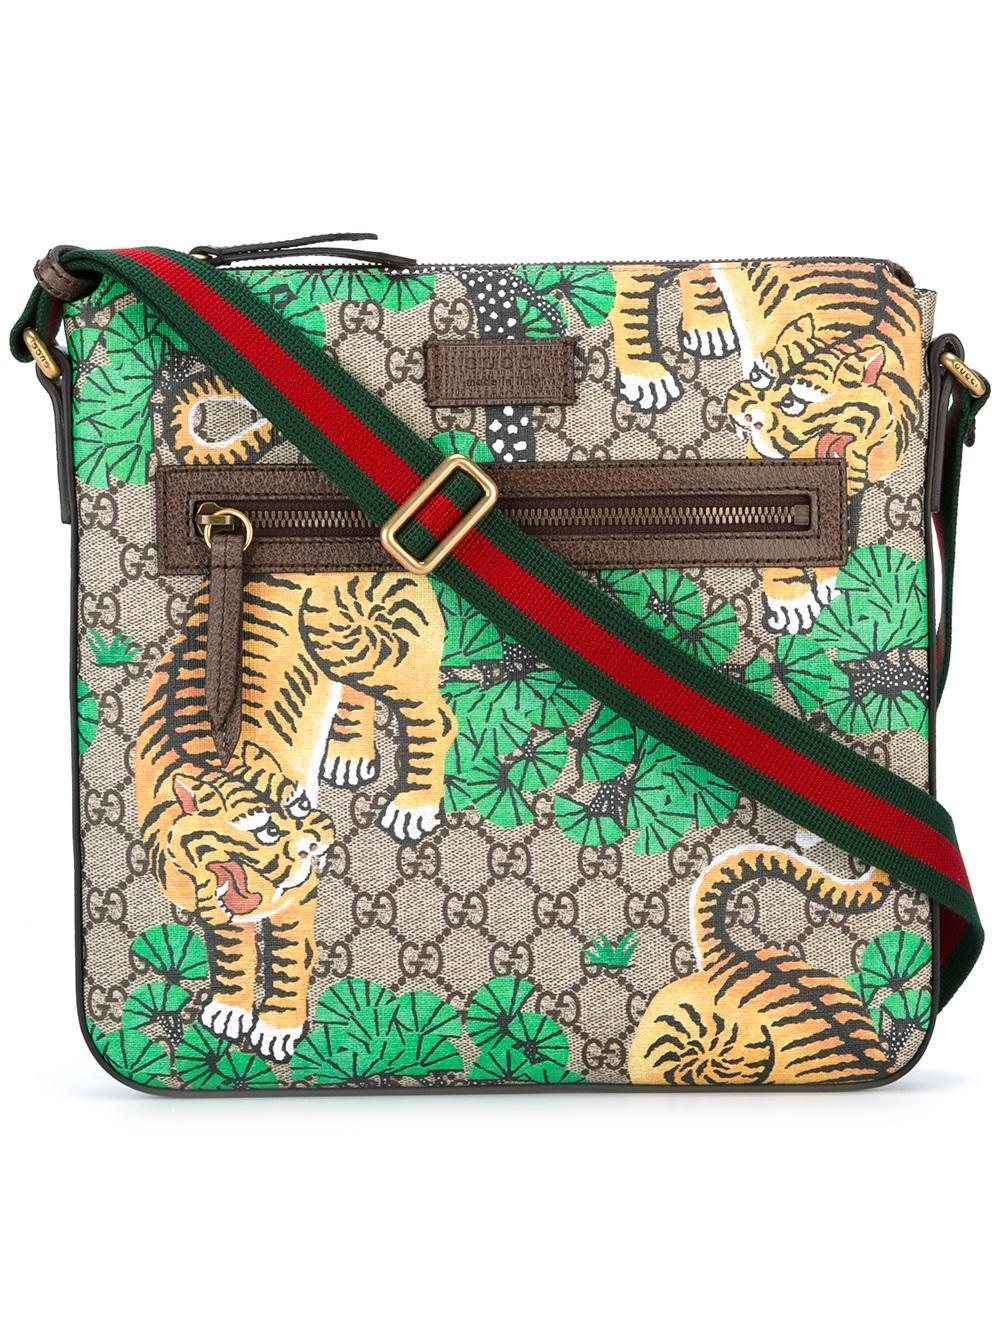 d43eacb51cc Gucci Gg Supreme Messenger Bag for Men - Lyst